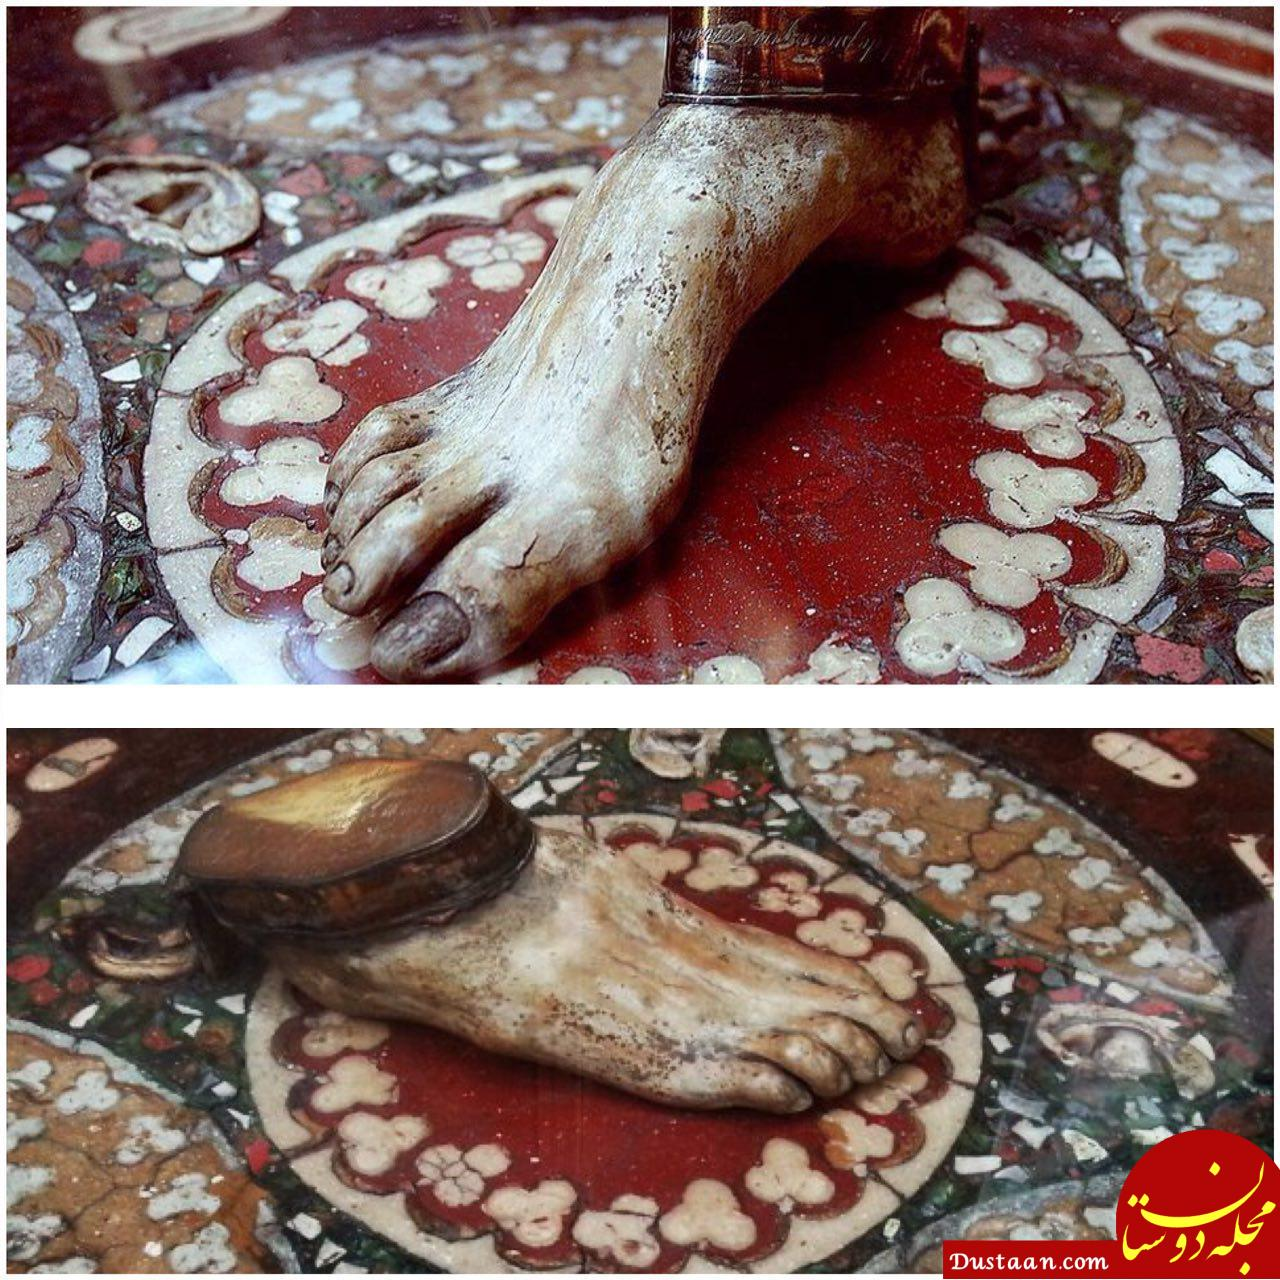 www.dustaan.com این میز با اعضای بدن انسان ساخته شده است! +عکس